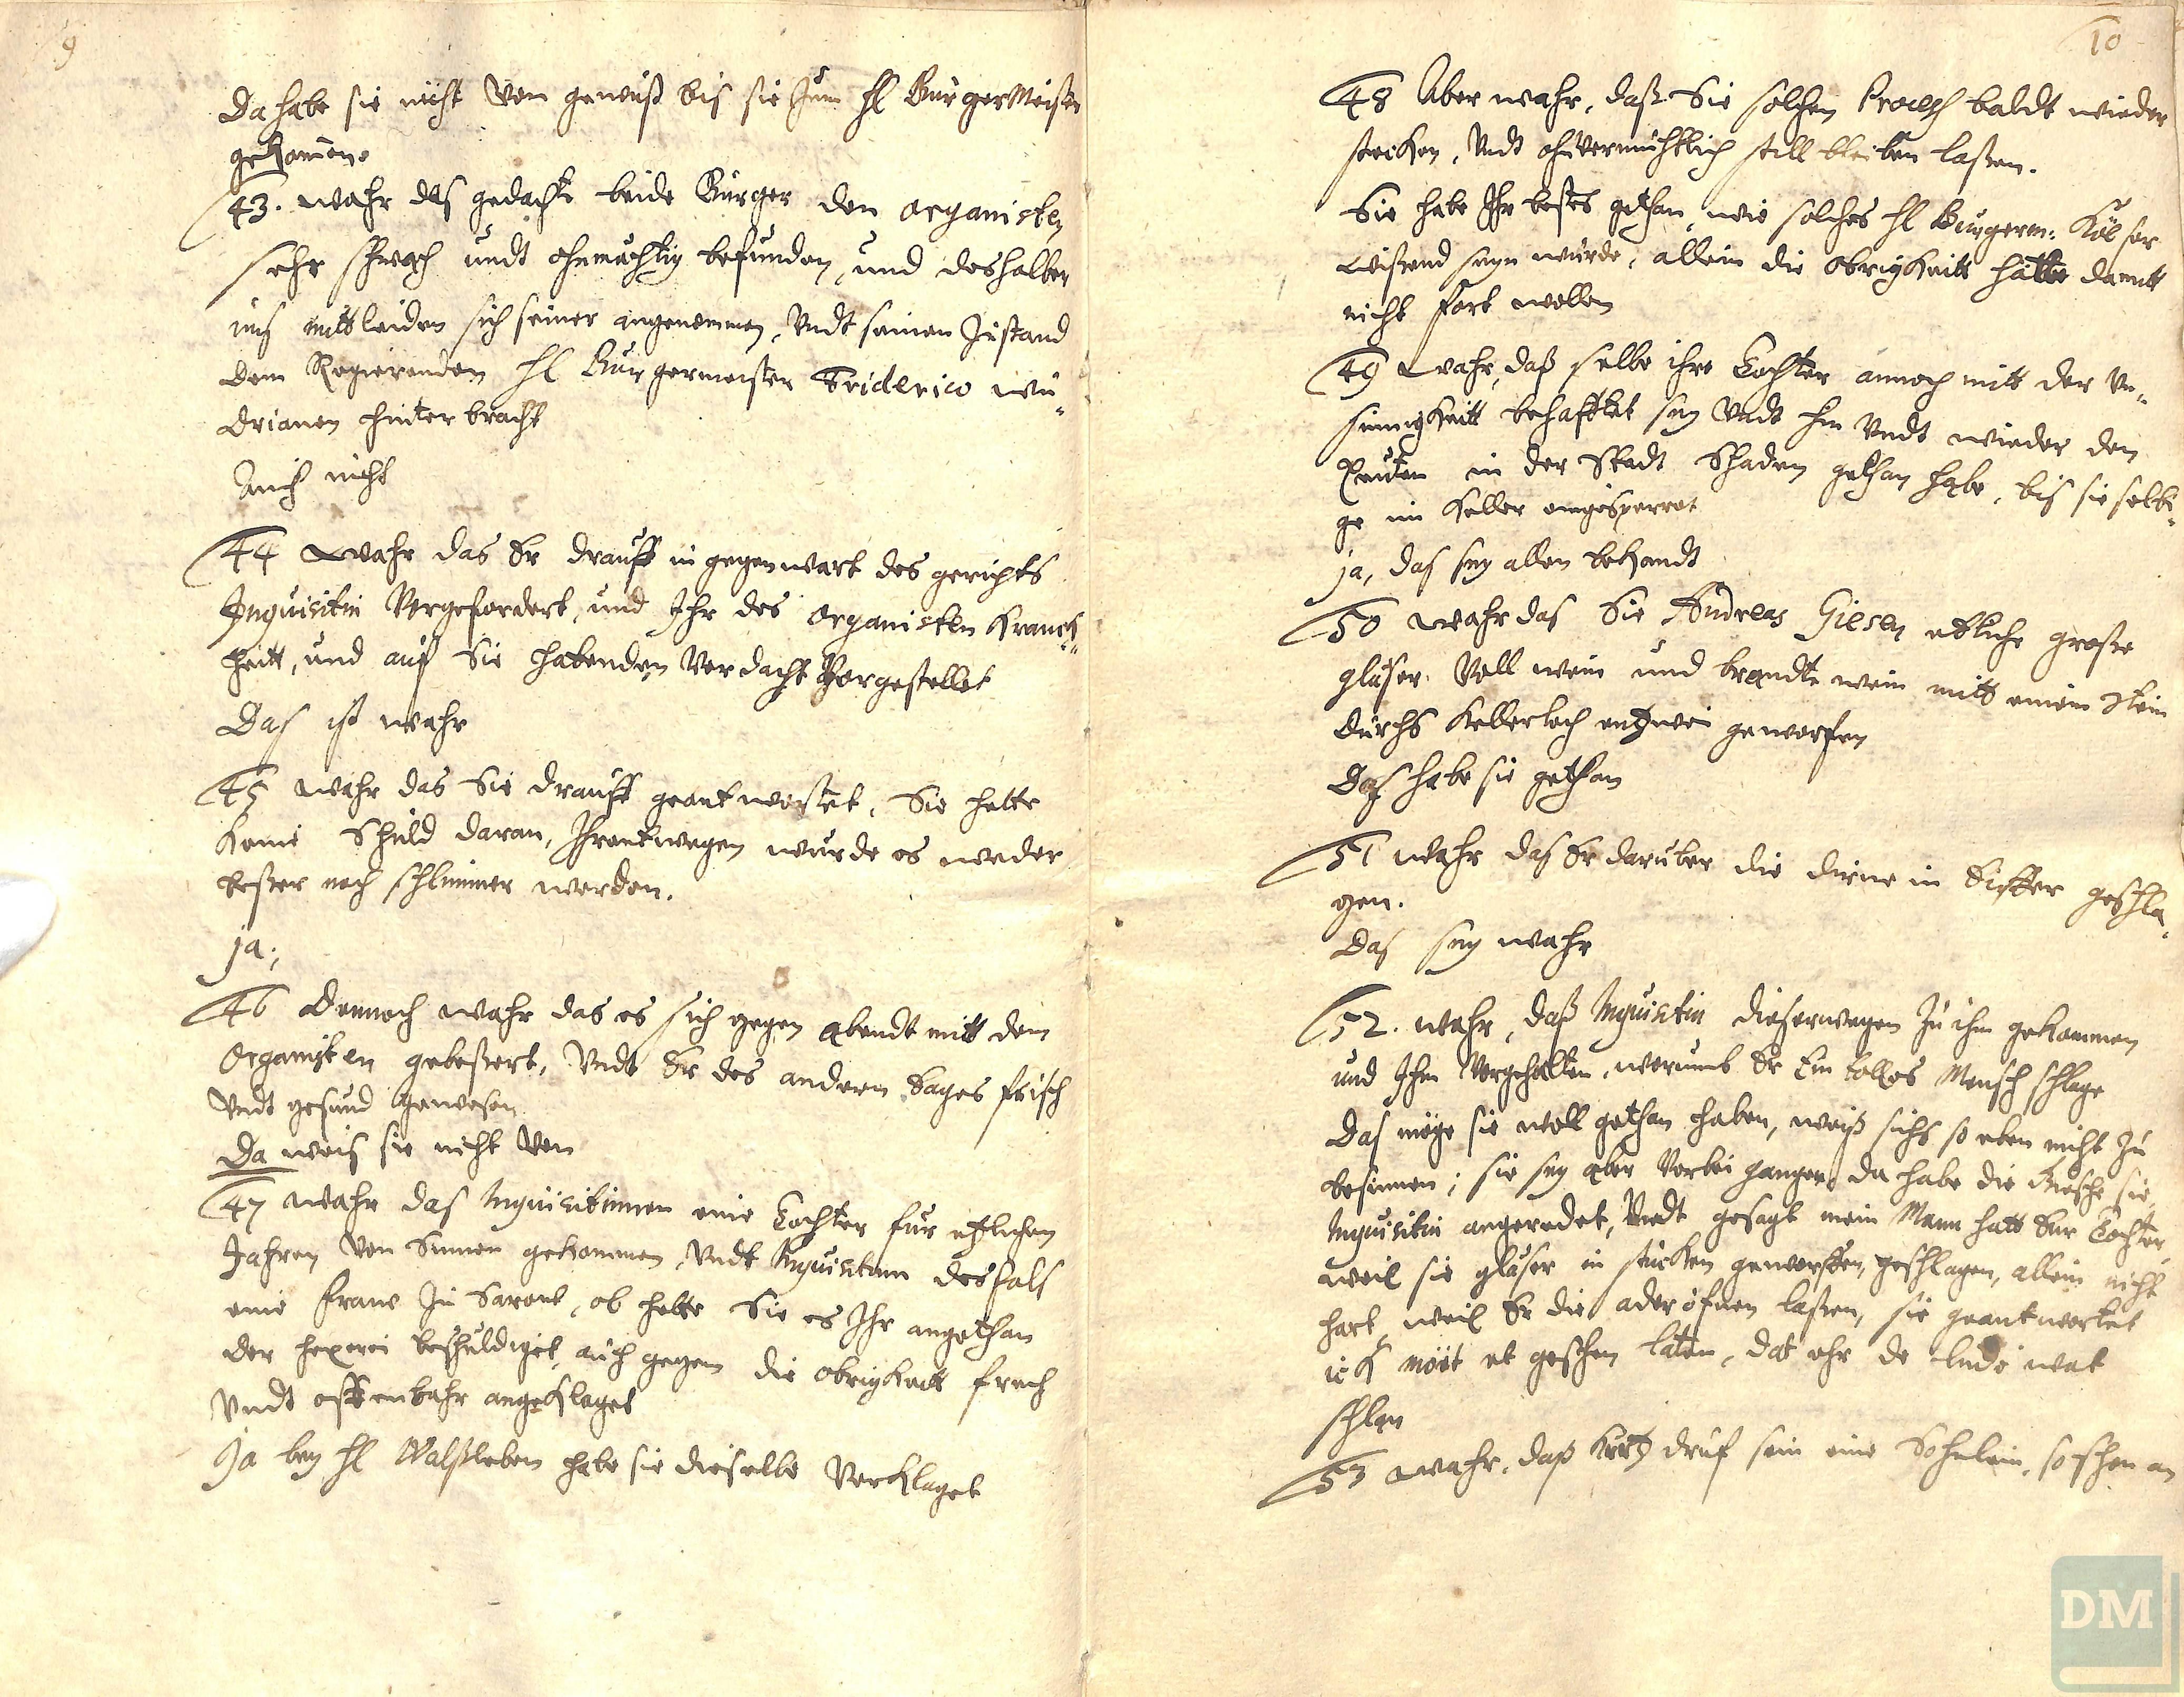 Witch trial against Stine Palms (or Petersche), 1675 - Demminer